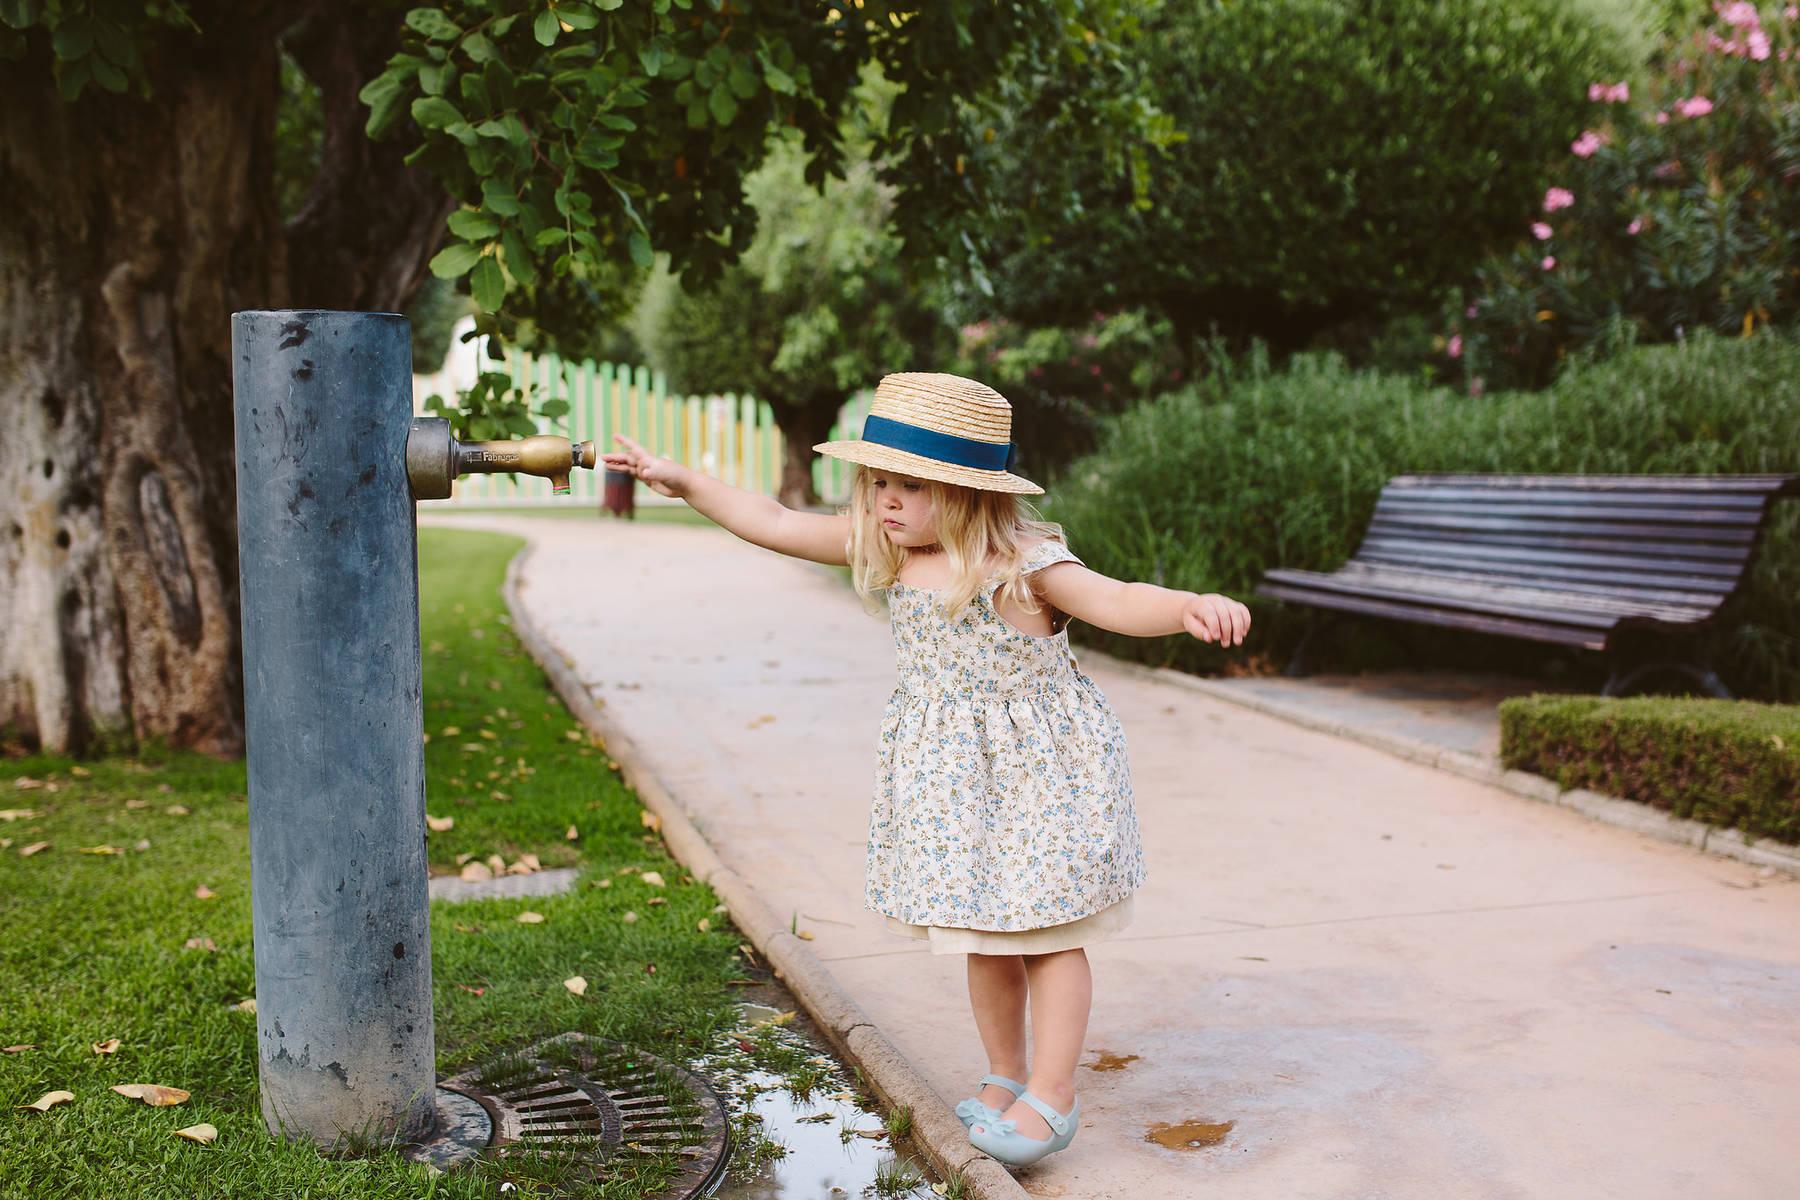 Семейная фотосессия в парке Бенаавис, Испания